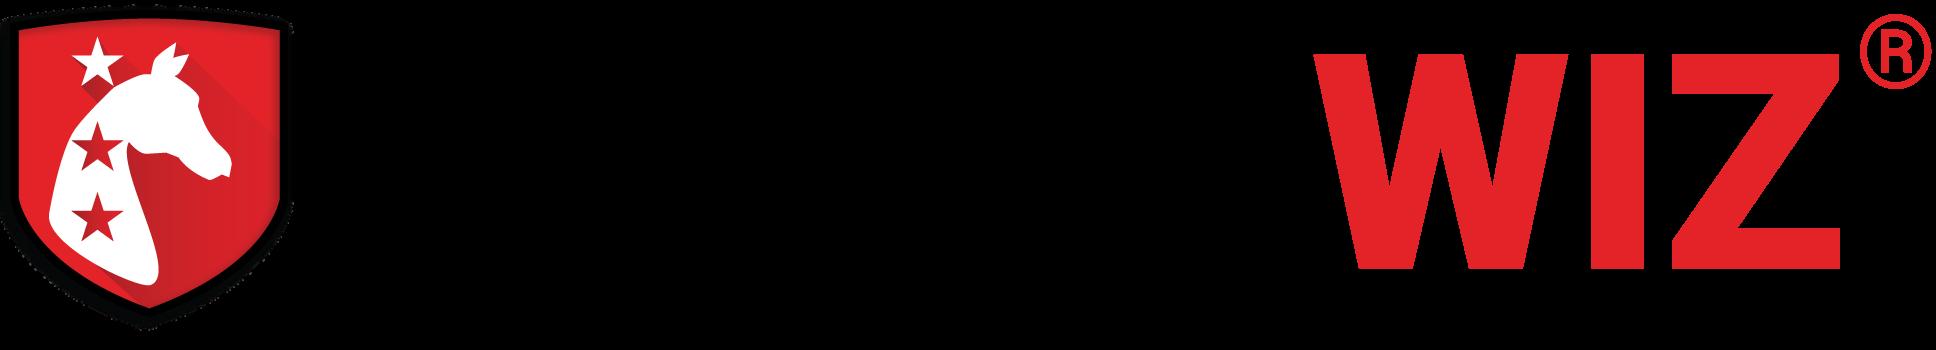 misctwassets-logo-text-lightbg.png